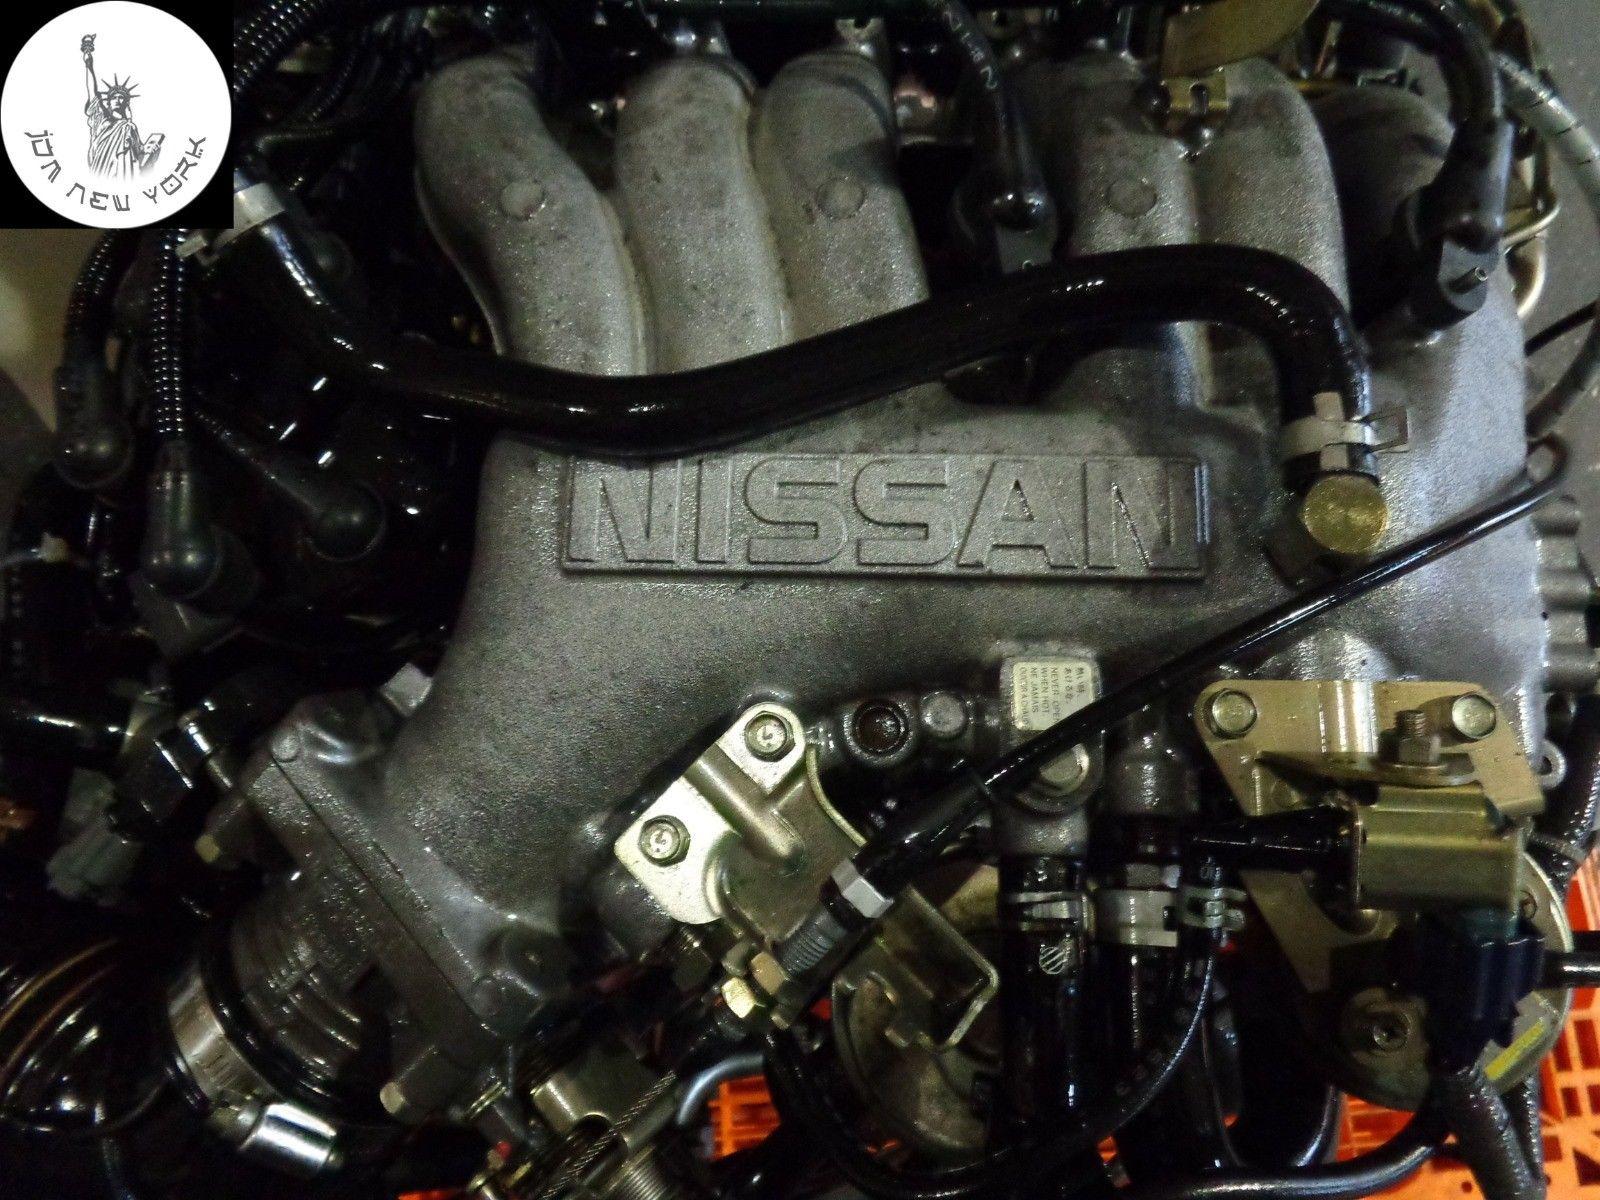 1996 2000 Nissan Pathfinder 3 3l Sohc V6 Engine Jdm Vg33 E Jdm New York